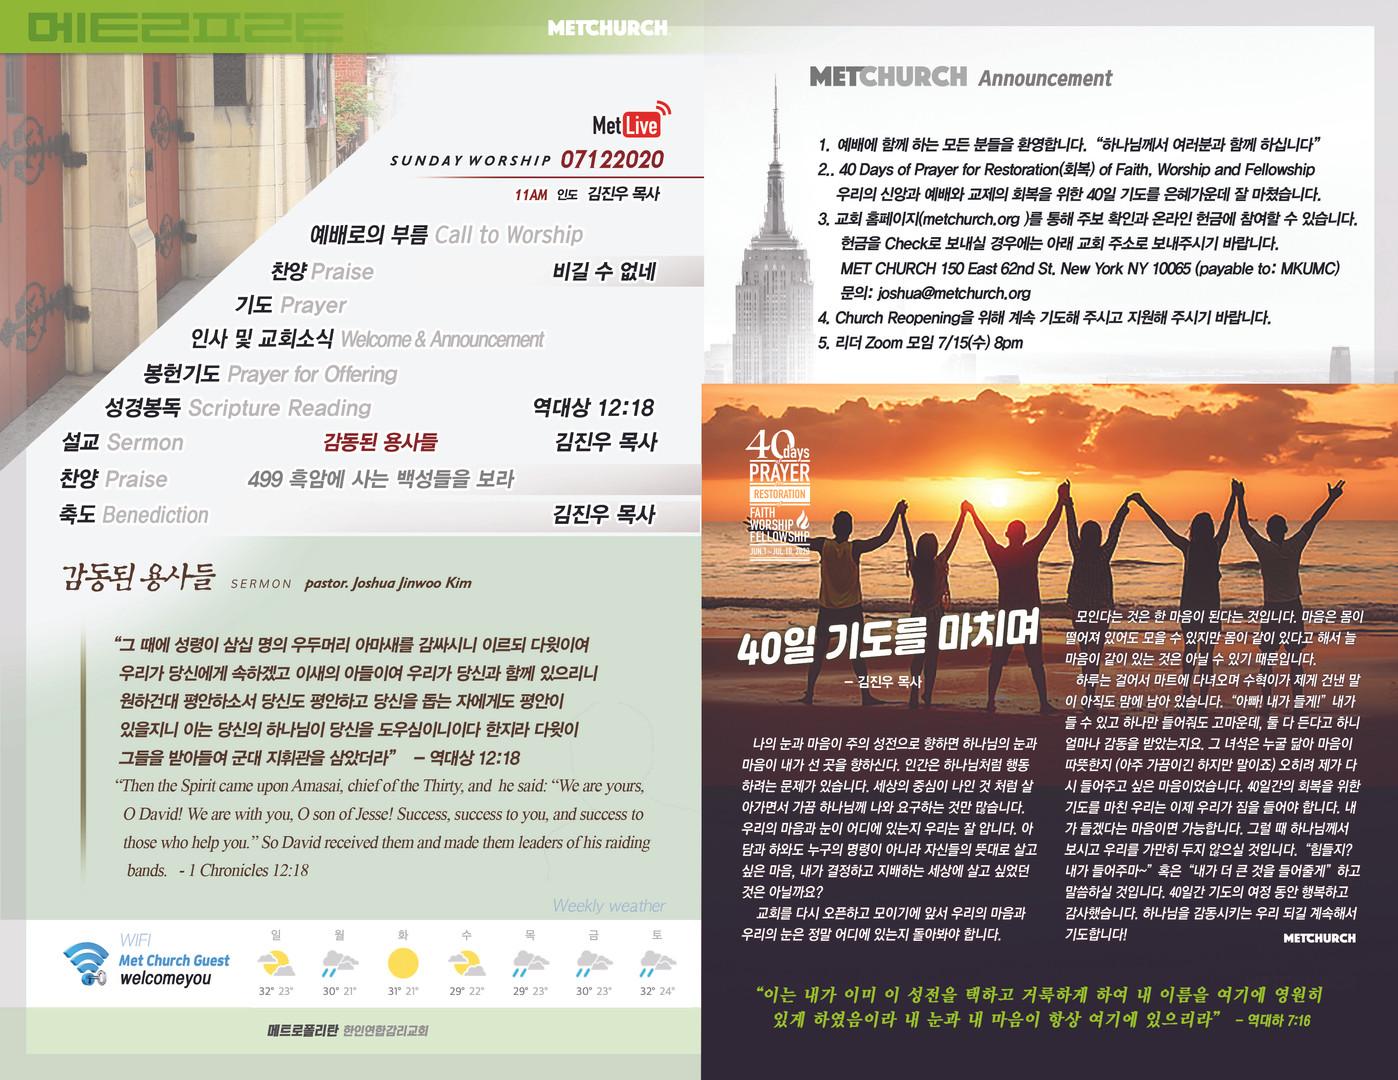 MetChurch_paper_Back_07122020.jpg